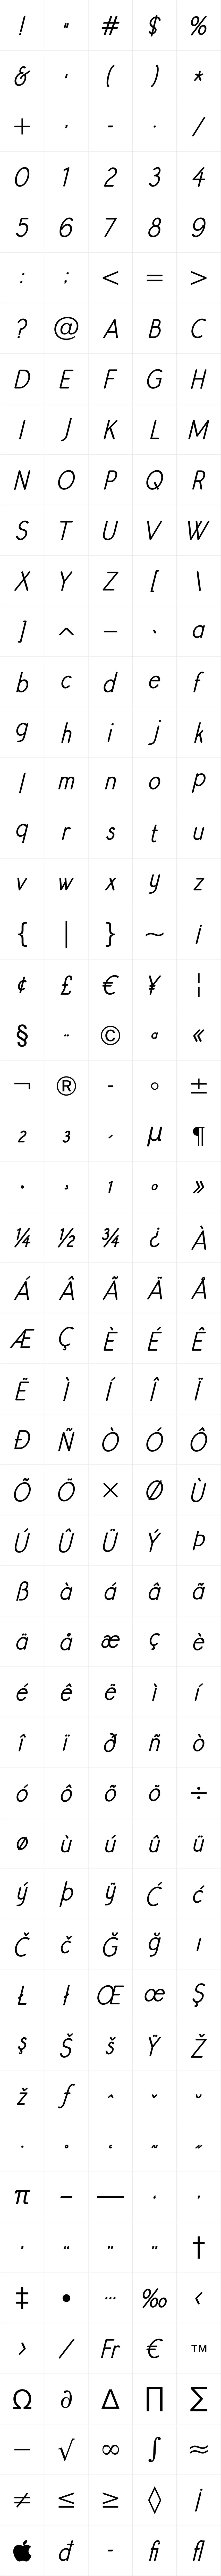 Register Sans BTN Condensed Bold Oblique